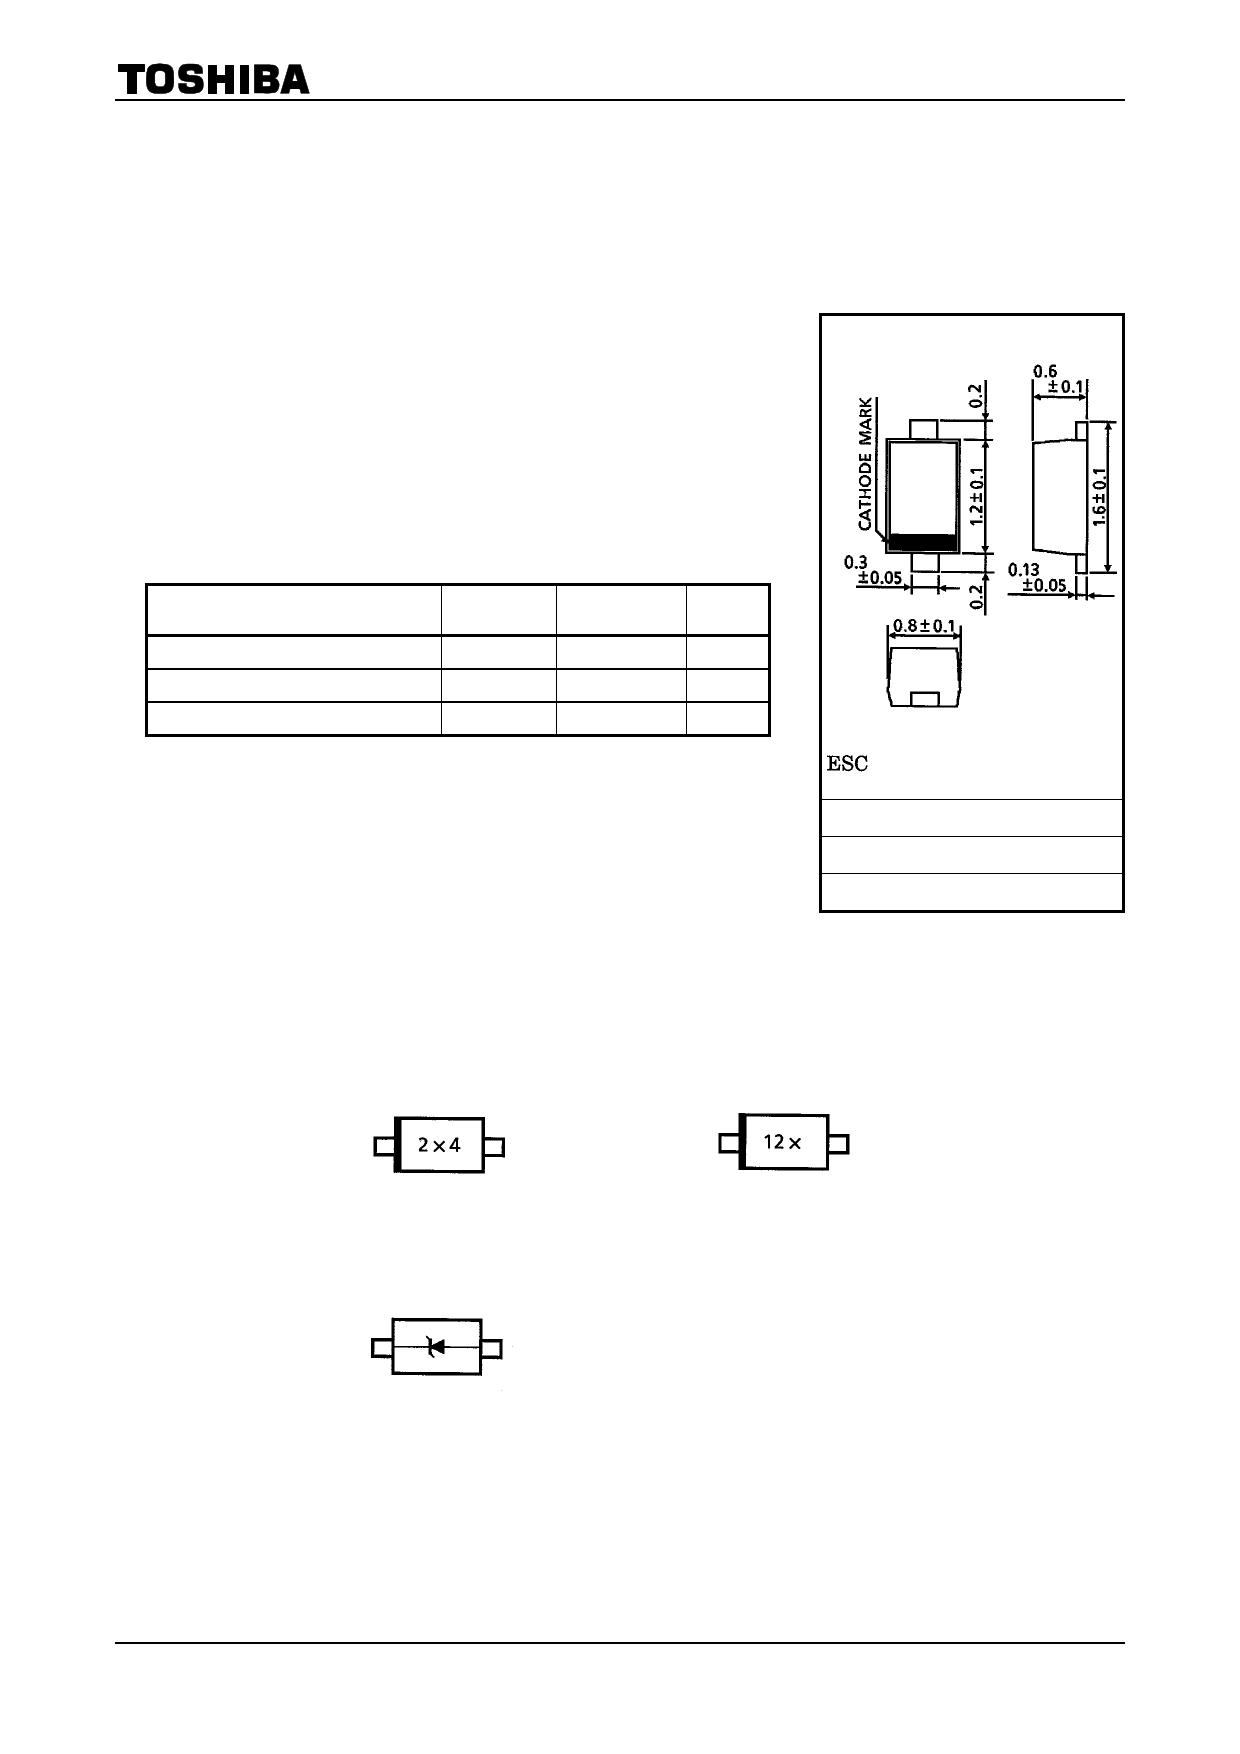 015AZ9.1 datasheet